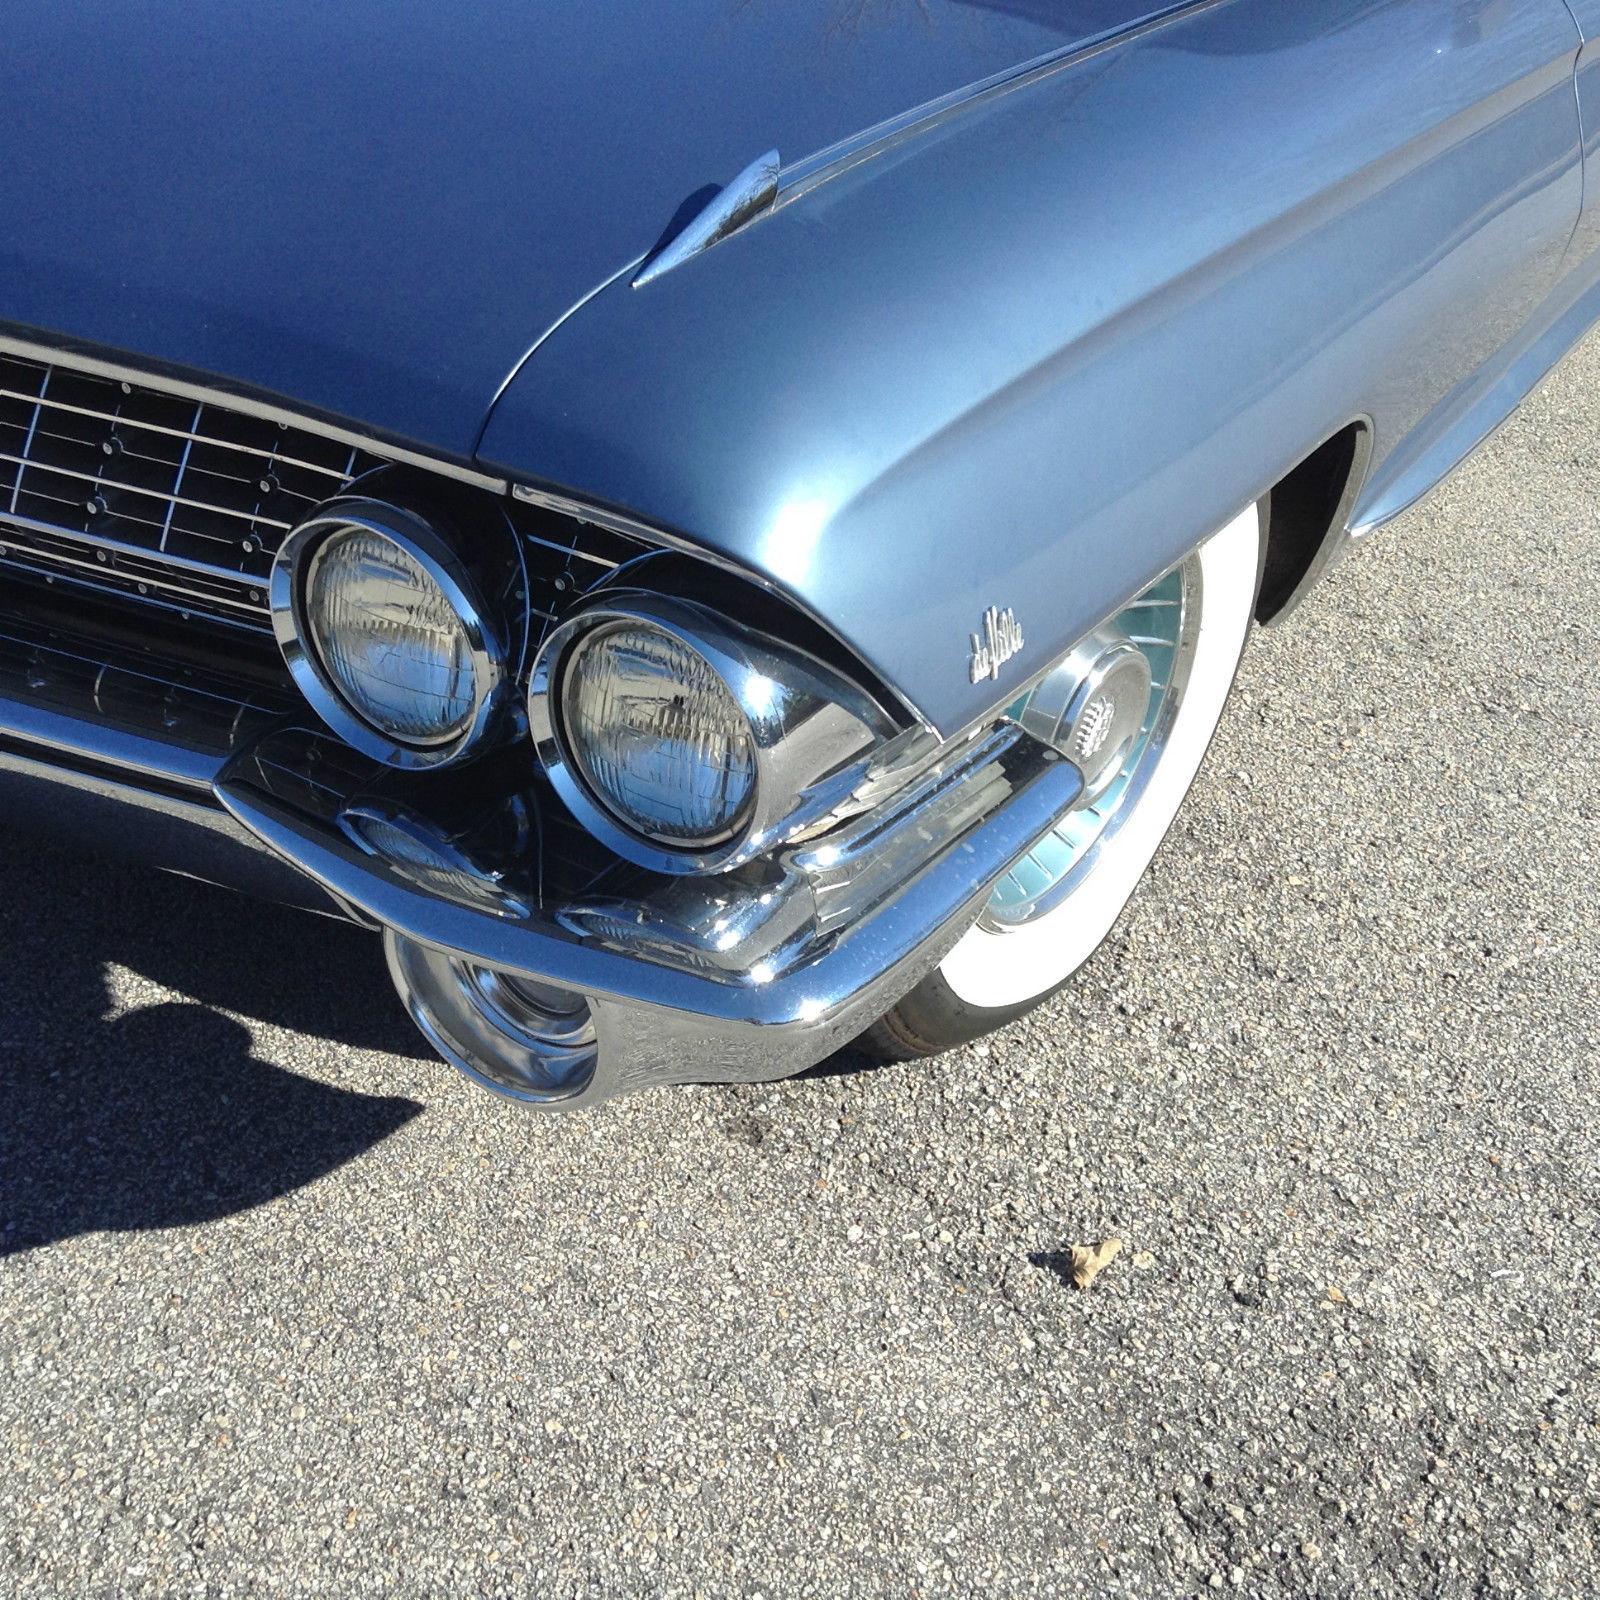 1961 Cadillac Sedan DeVille 4 Window